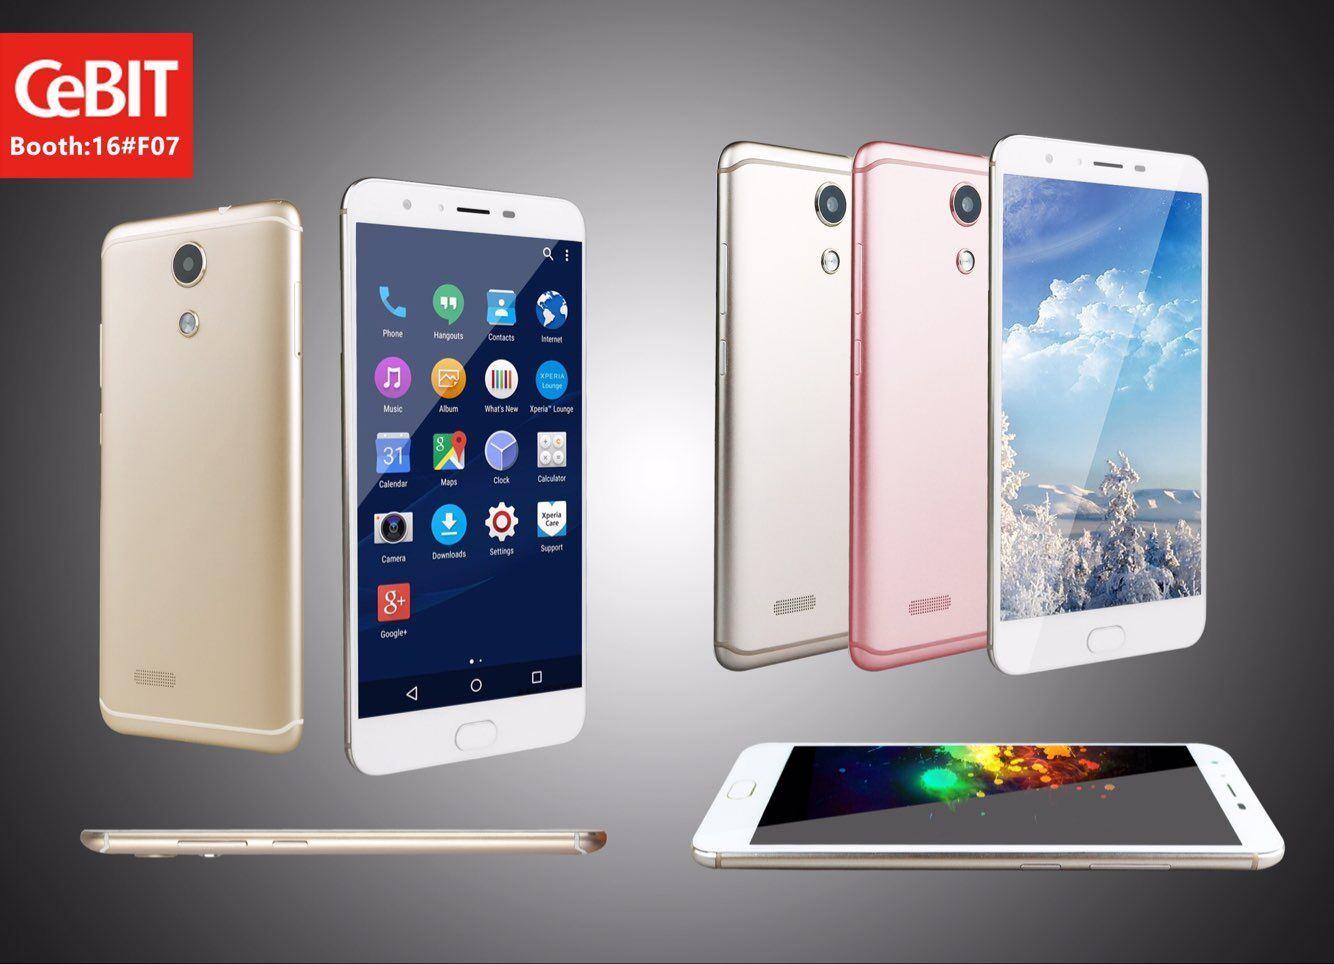 5.5 Inch OLED 720*1280 Display 16MP Camera Octa-Core 4G China Smartphone